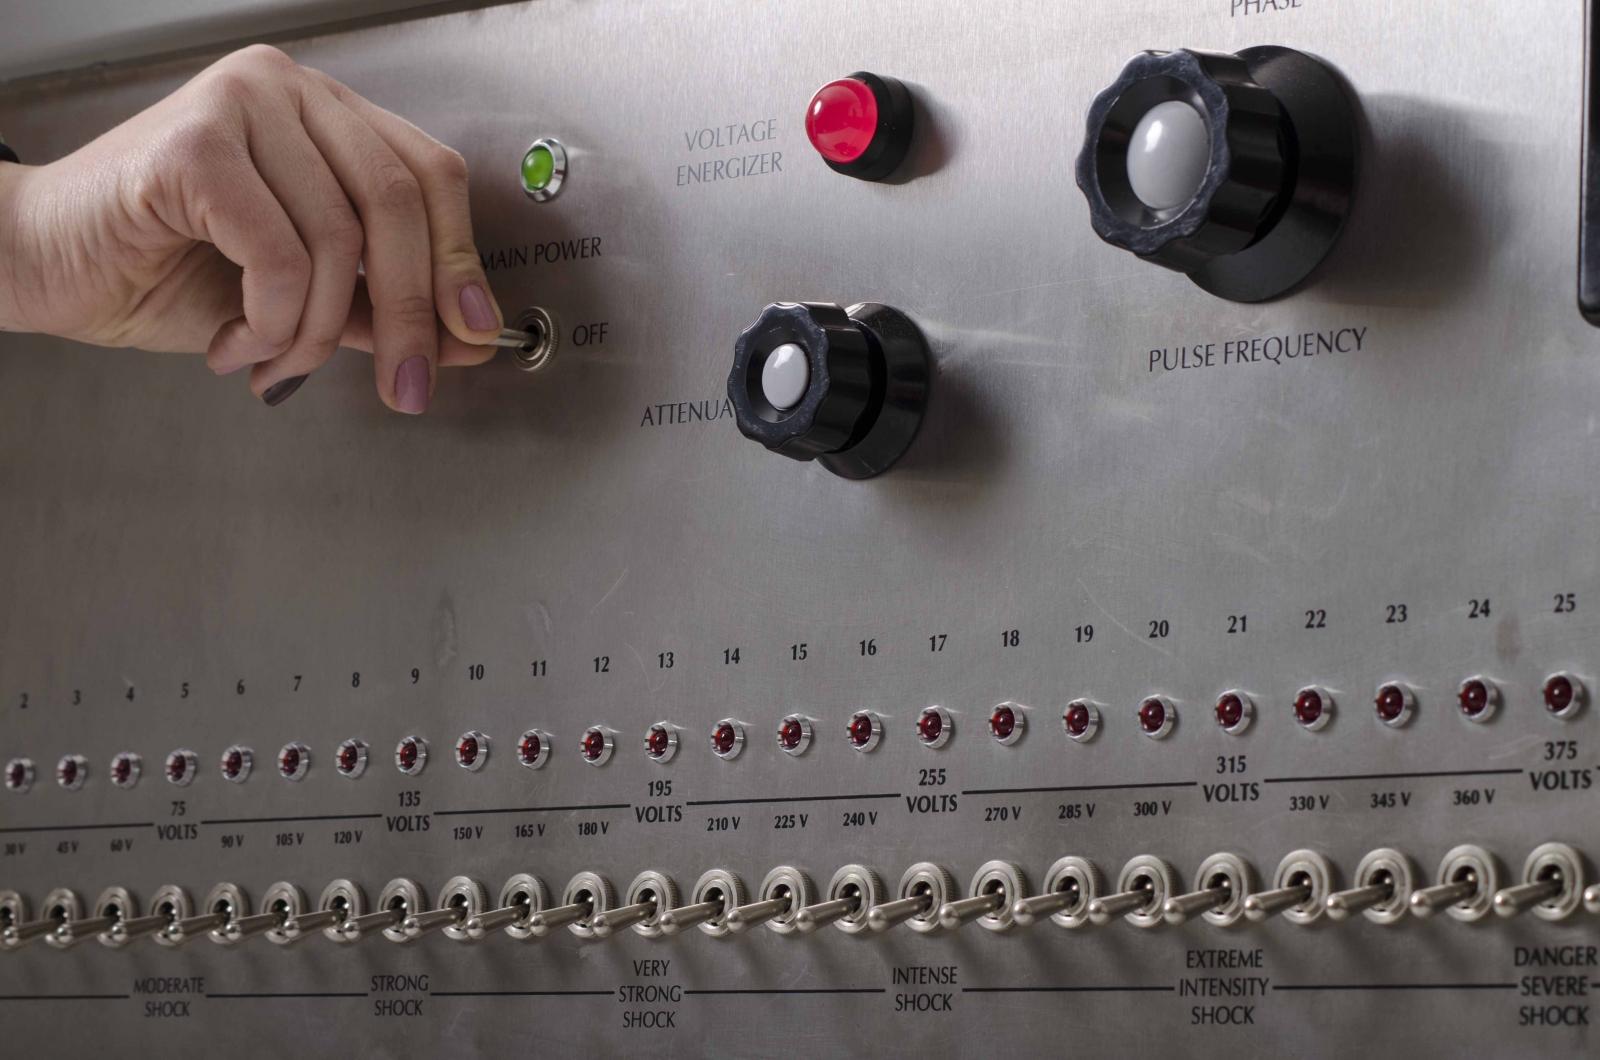 Milgram obedience study criticisms